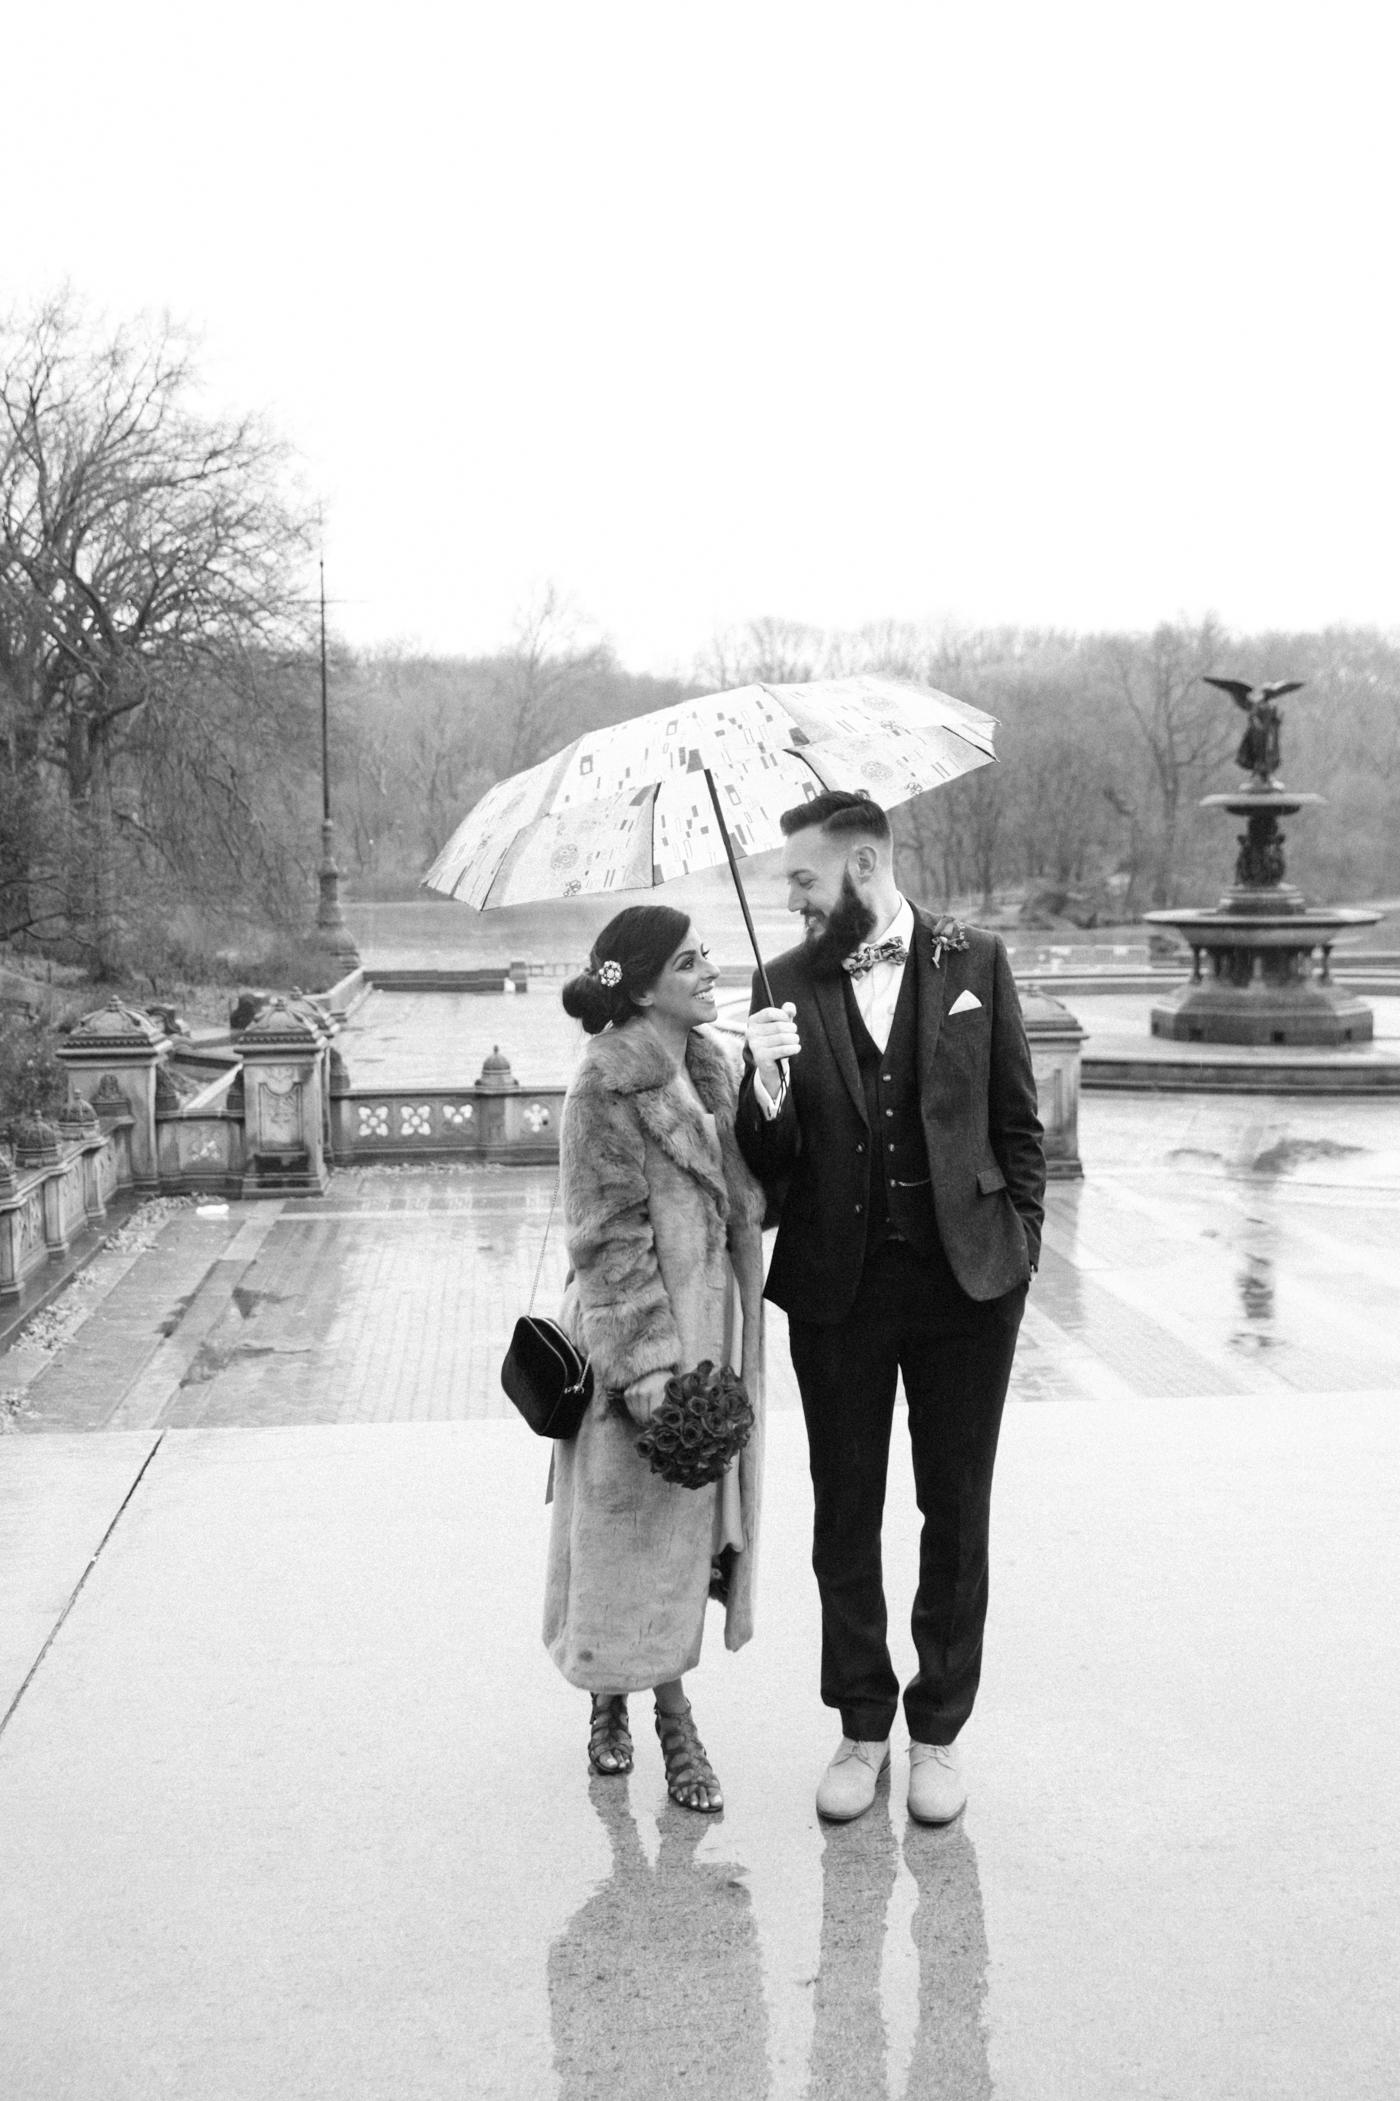 Central-park-wedding-by-Tanya-Isaeva-25.jpg